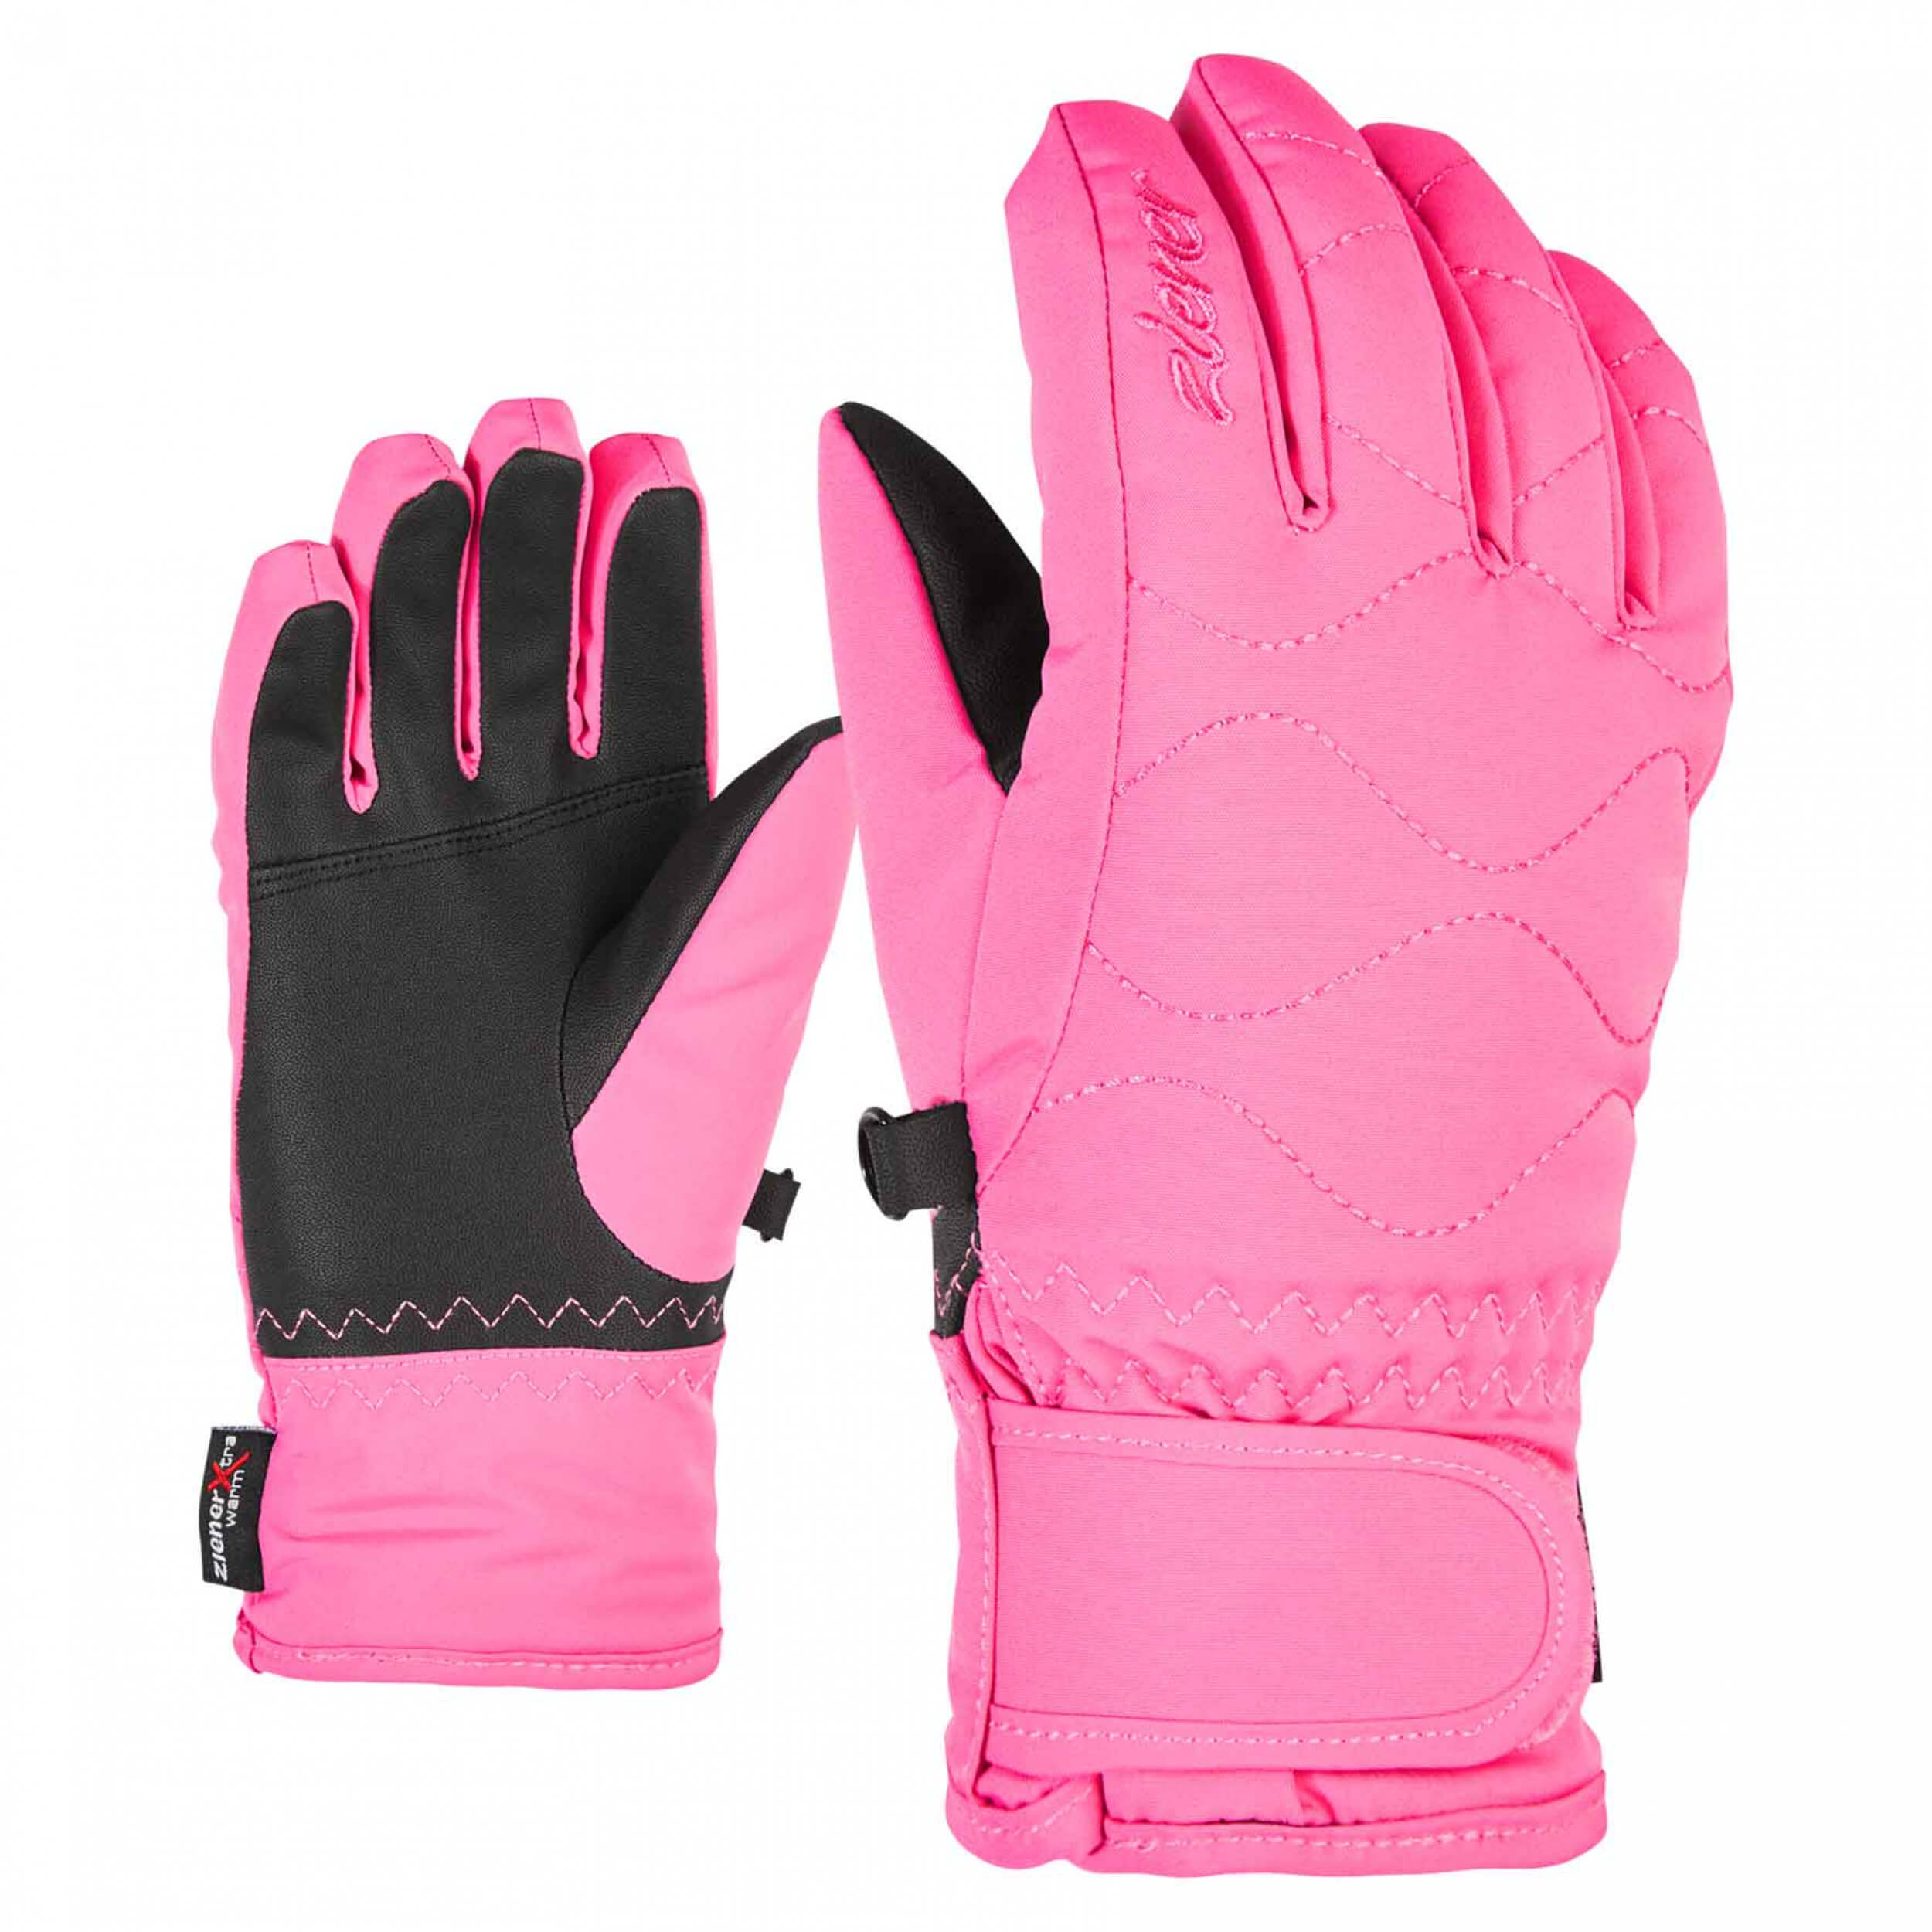 ZIENER Kinder Ski-Handschuhe Lanta AQUASHIELD pink 256